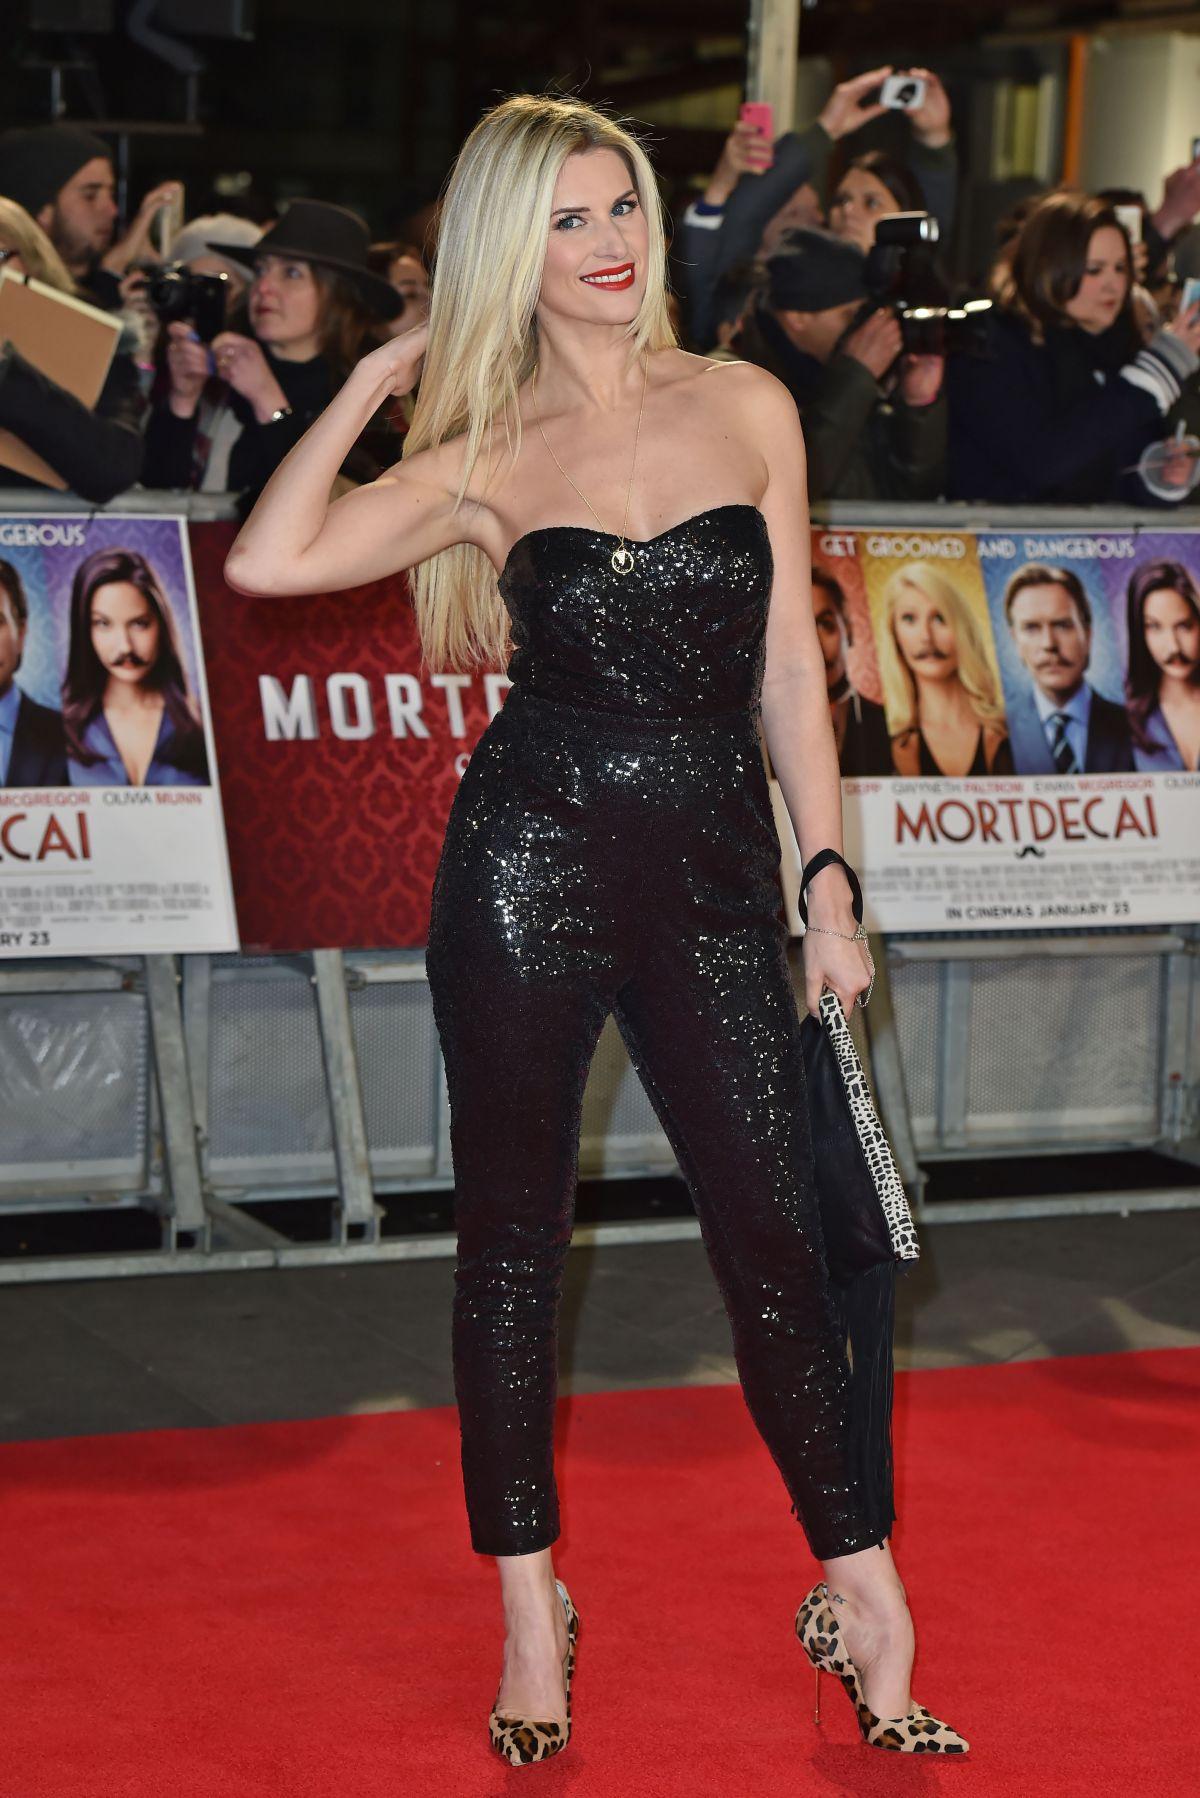 Sarah Jayne Dunn At Mortdecai Premiere In London Hawtcelebs